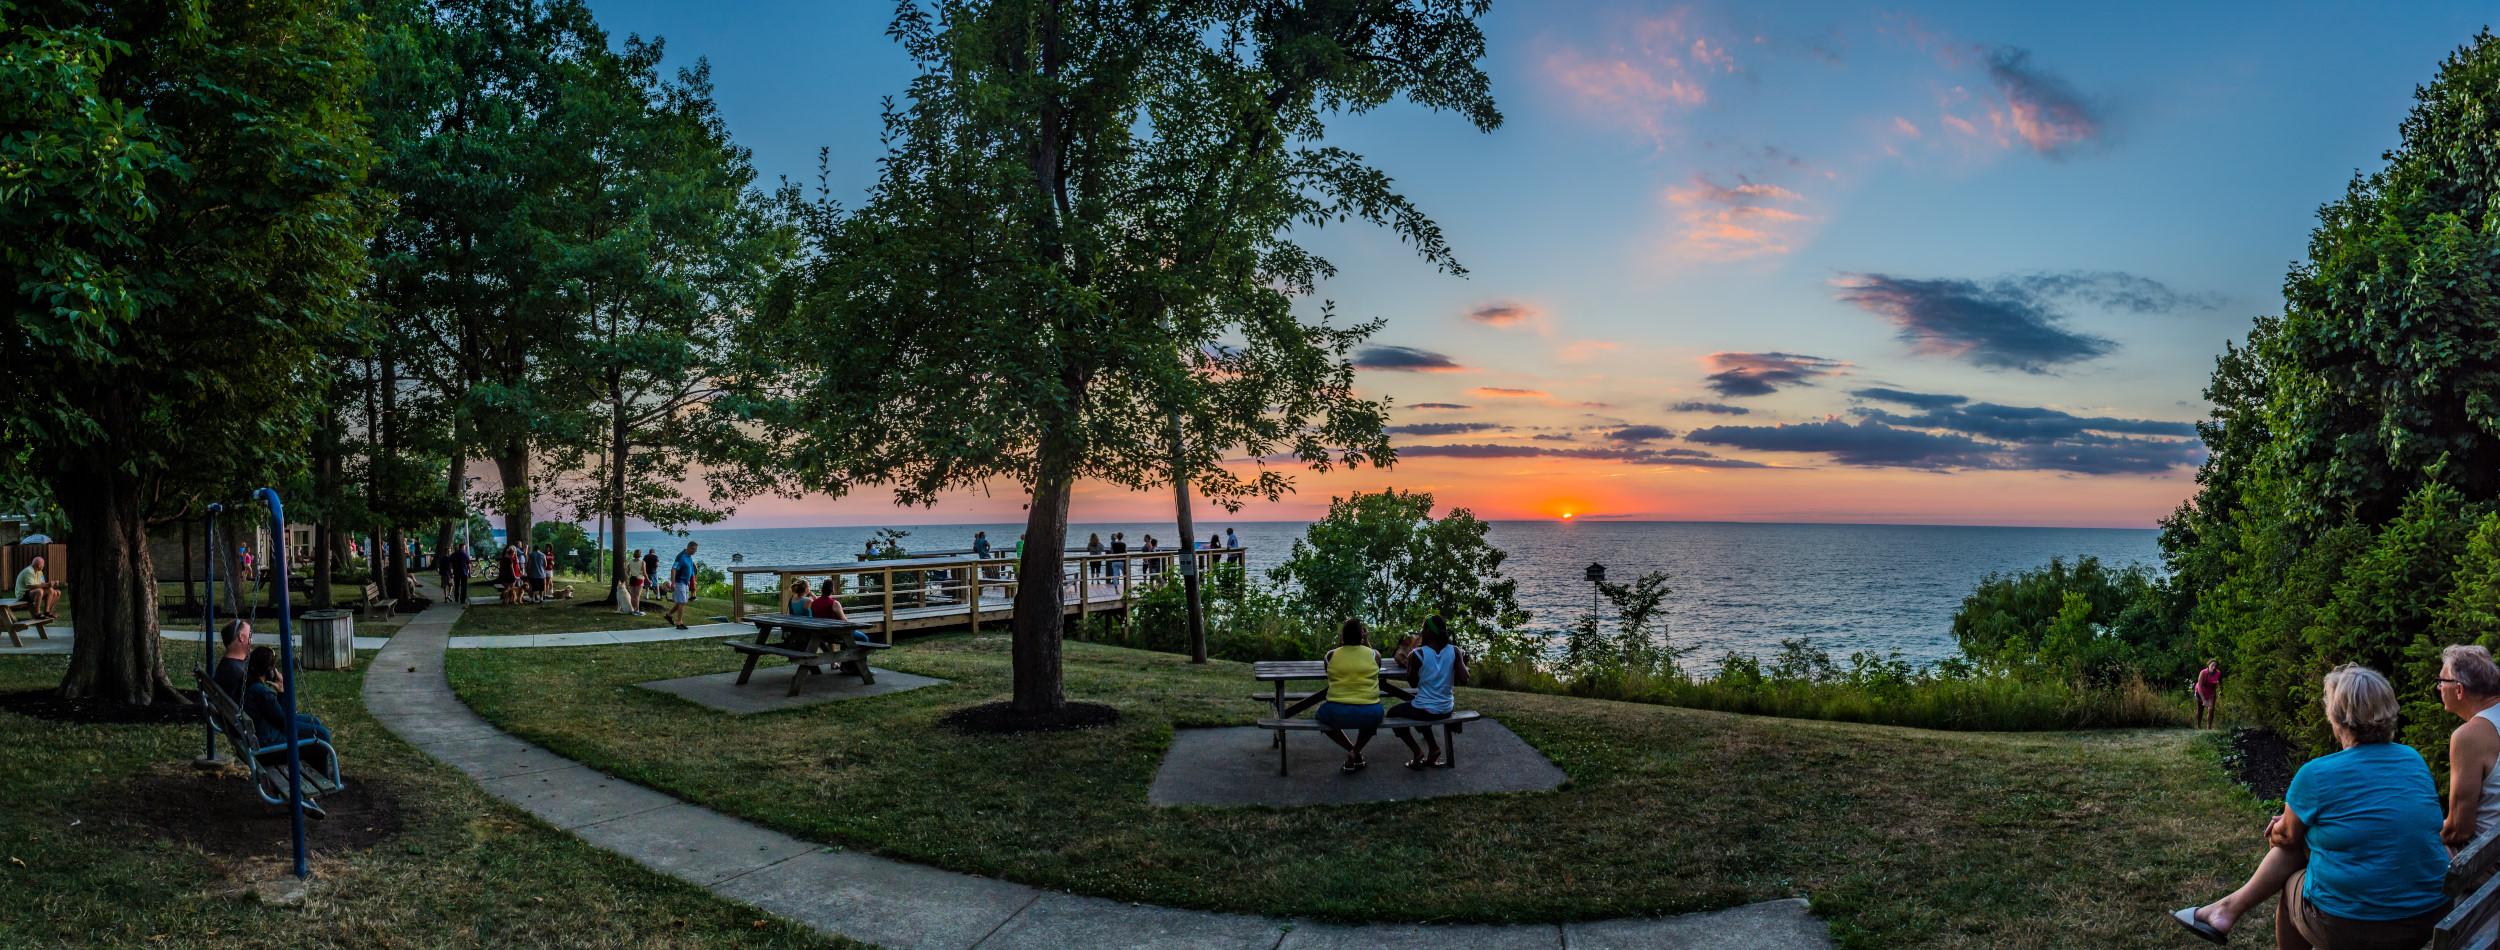 Lakefront Lodge at sunset- PC: Jim Marquardt